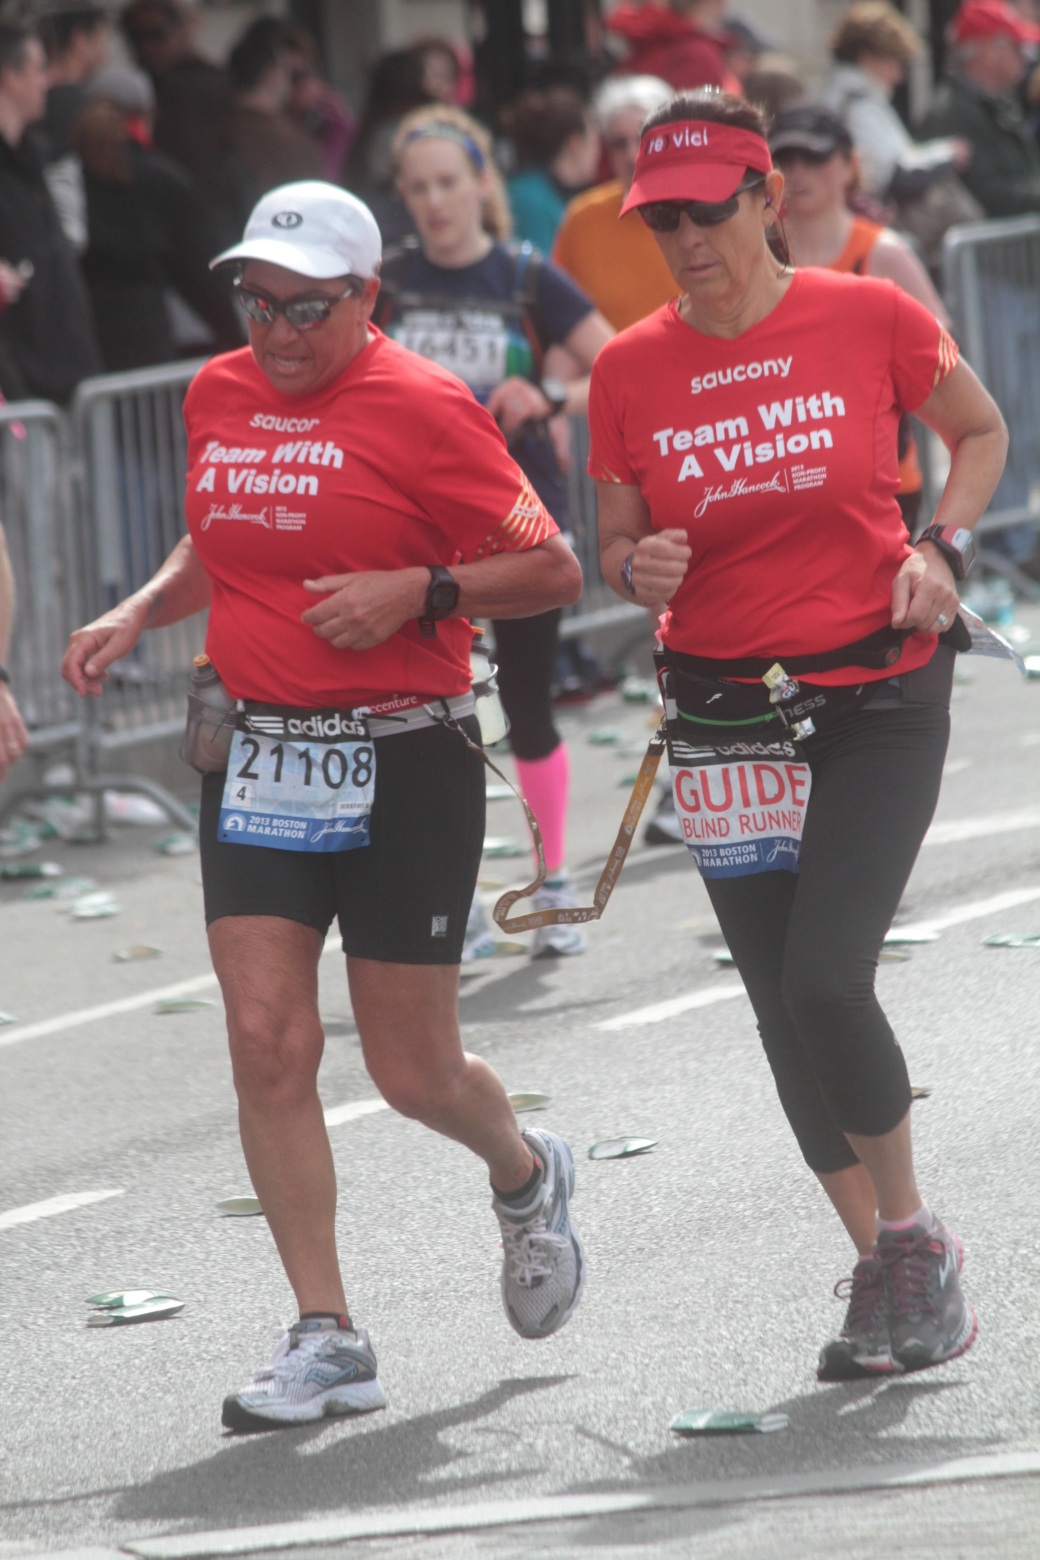 boston marathon 2013 number 21108